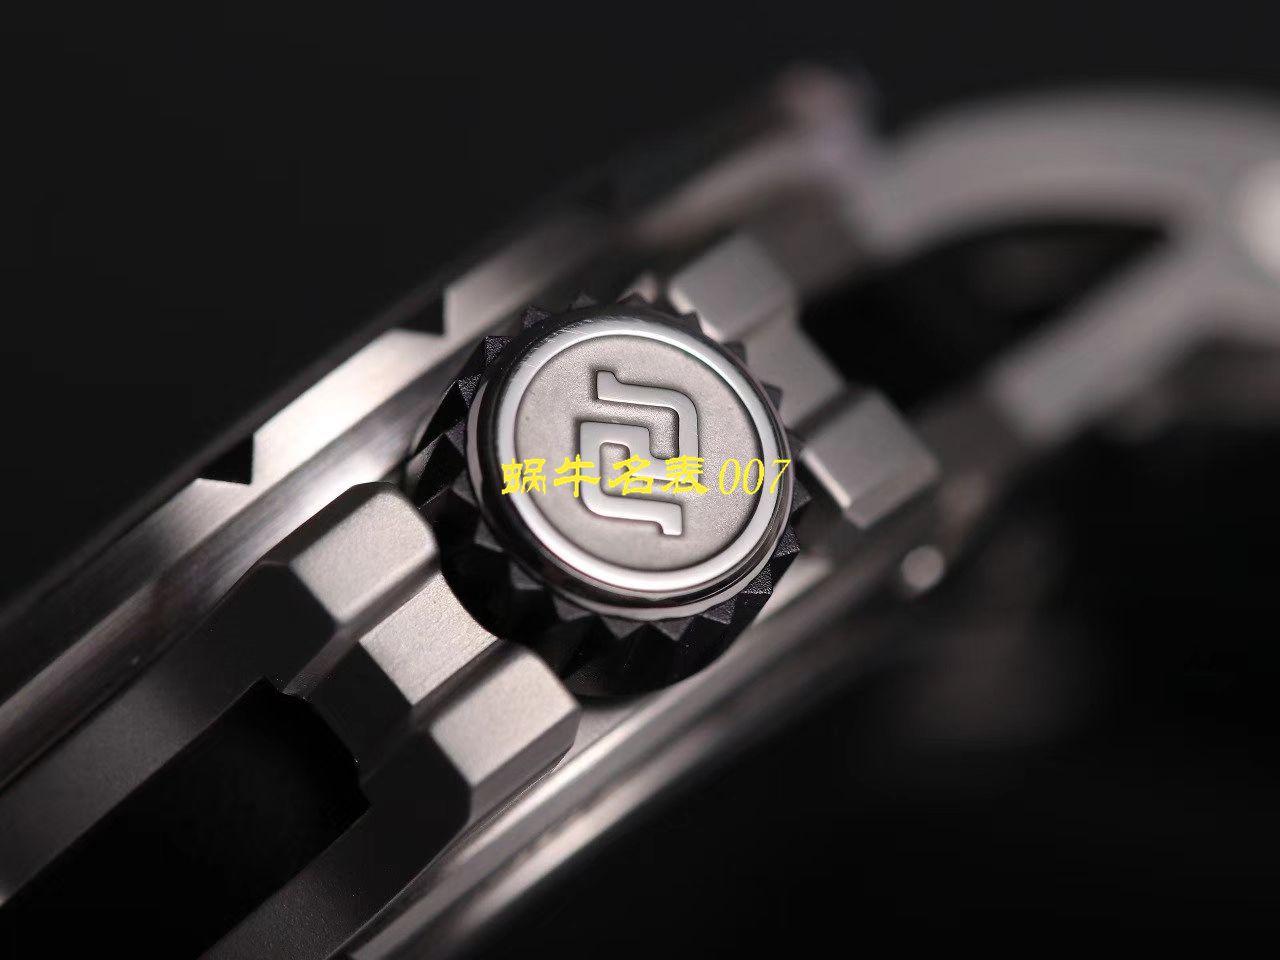 JB厂罗杰杜彼Excalibur Spidr(王者系列)复刻表RDDBEX0545,RDDBEX0546,RDDBEX0479陀飞轮腕表 / LJ057